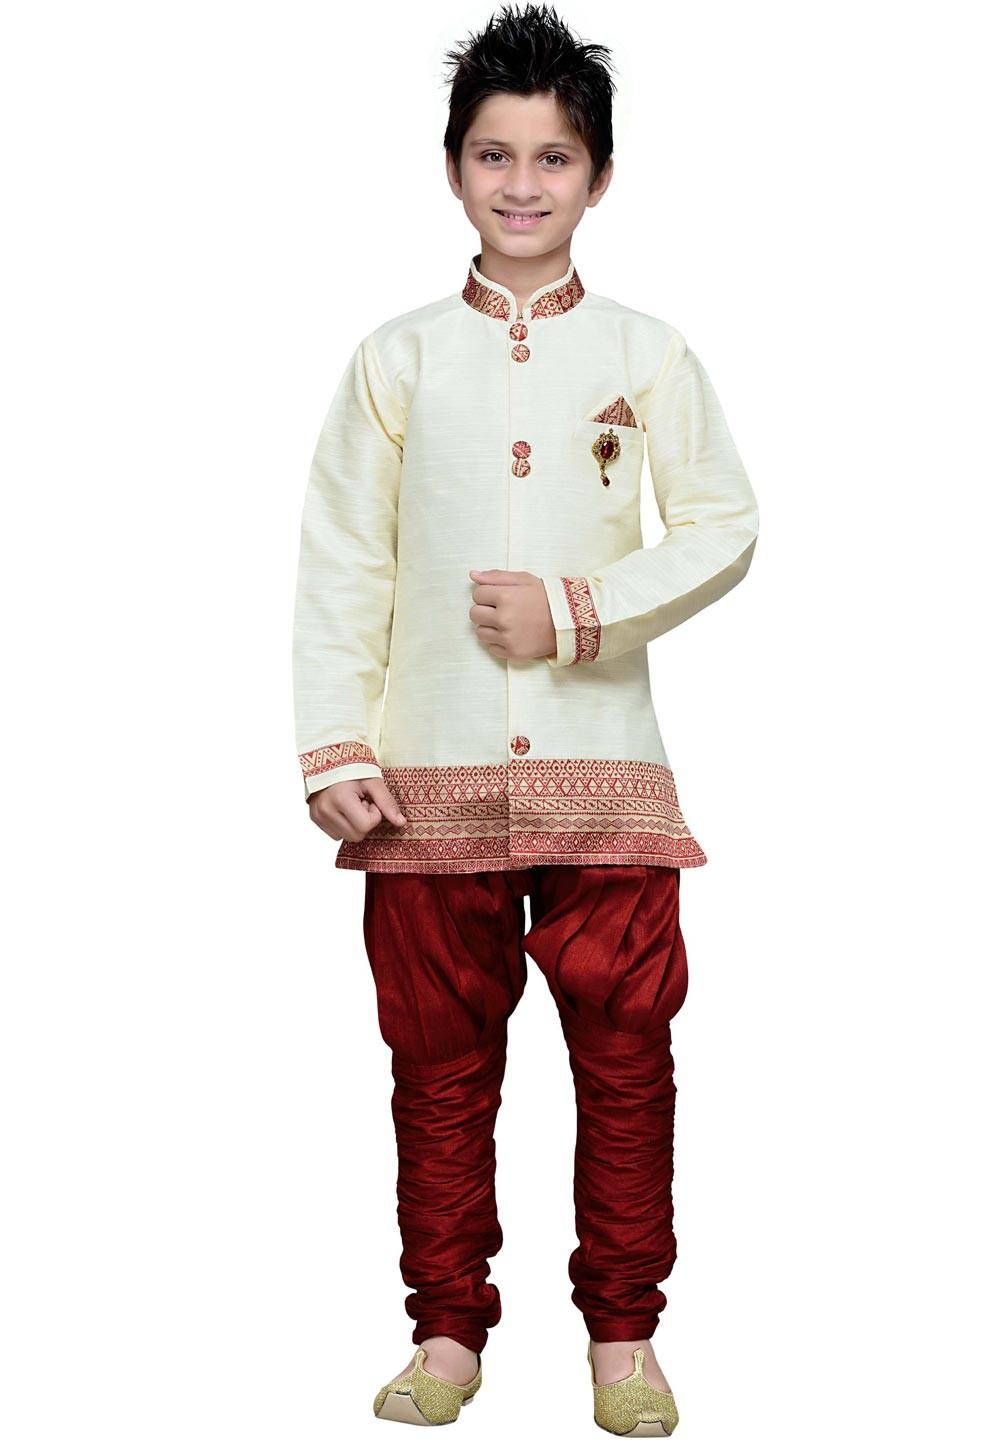 Off White Color Boy's Kurta Pajama.